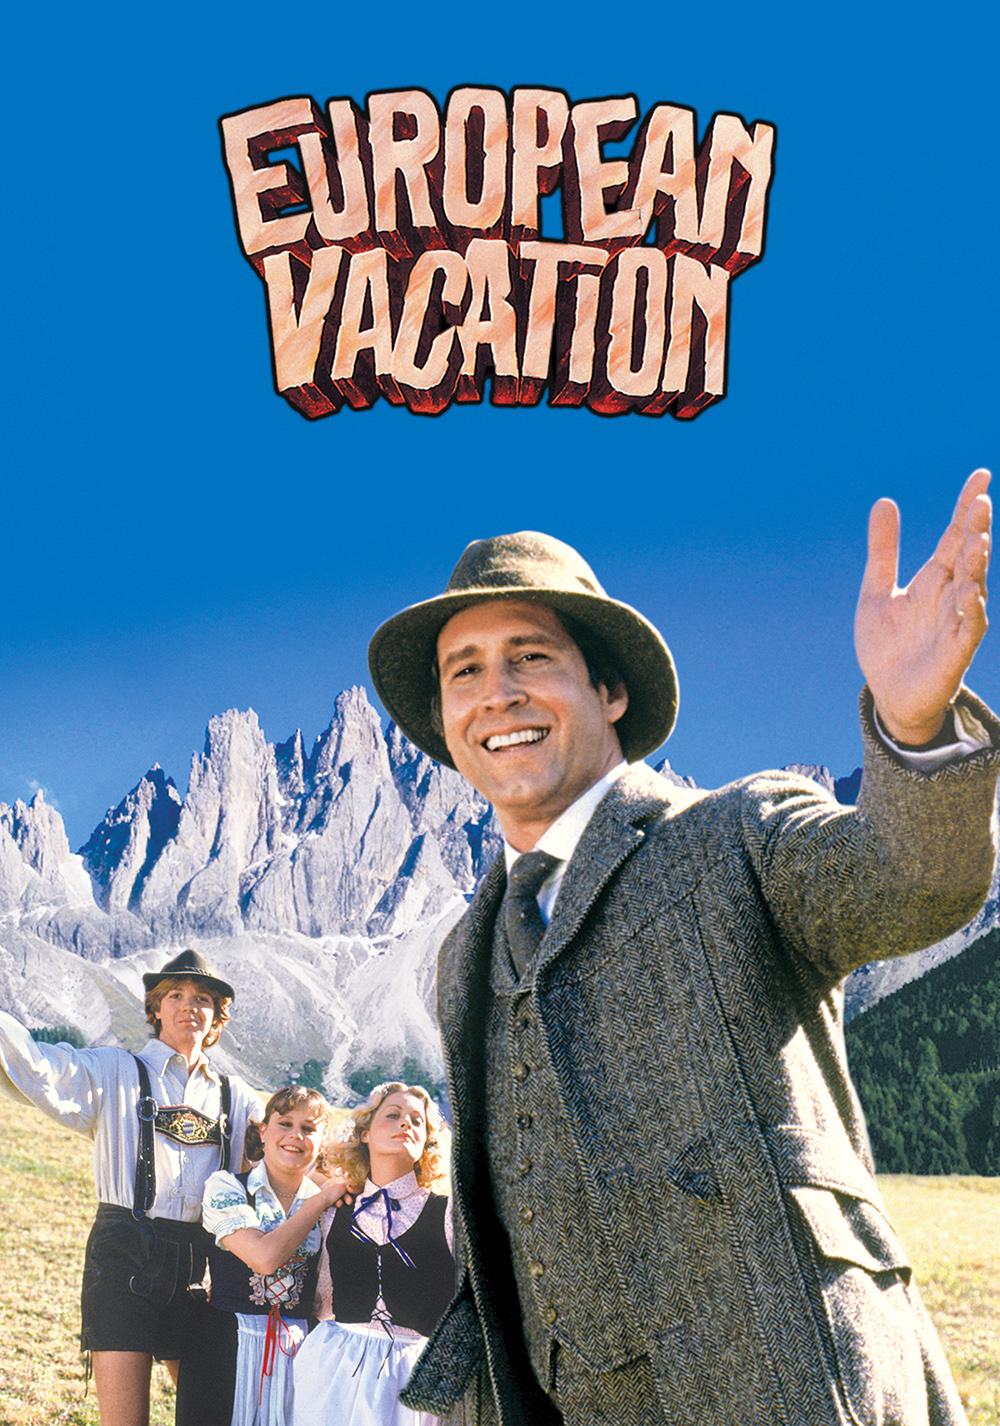 European Vacation | Movie fanart | fanart.tv